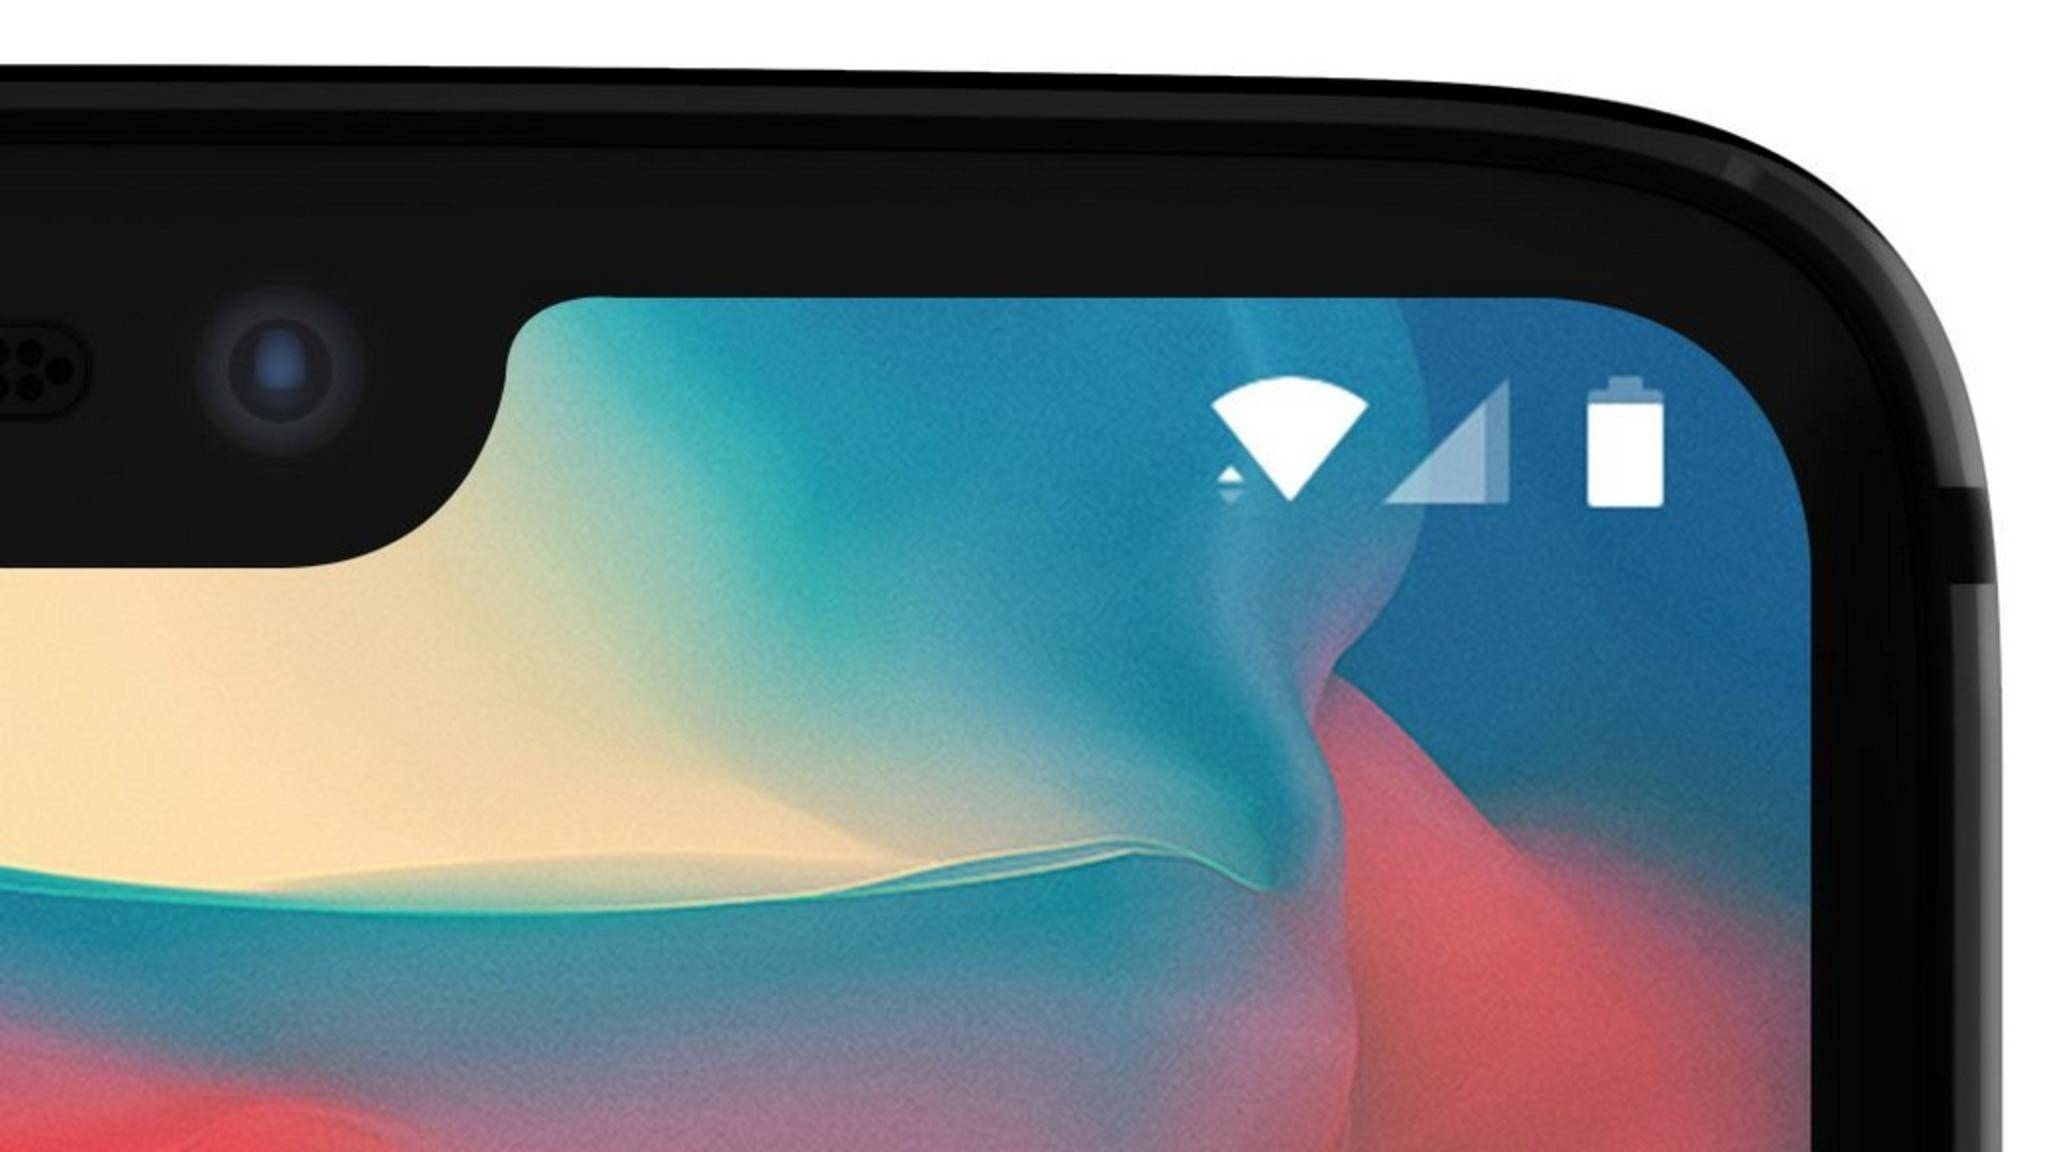 Das OnePlus 6 bekommt eine Display-Kerbe.